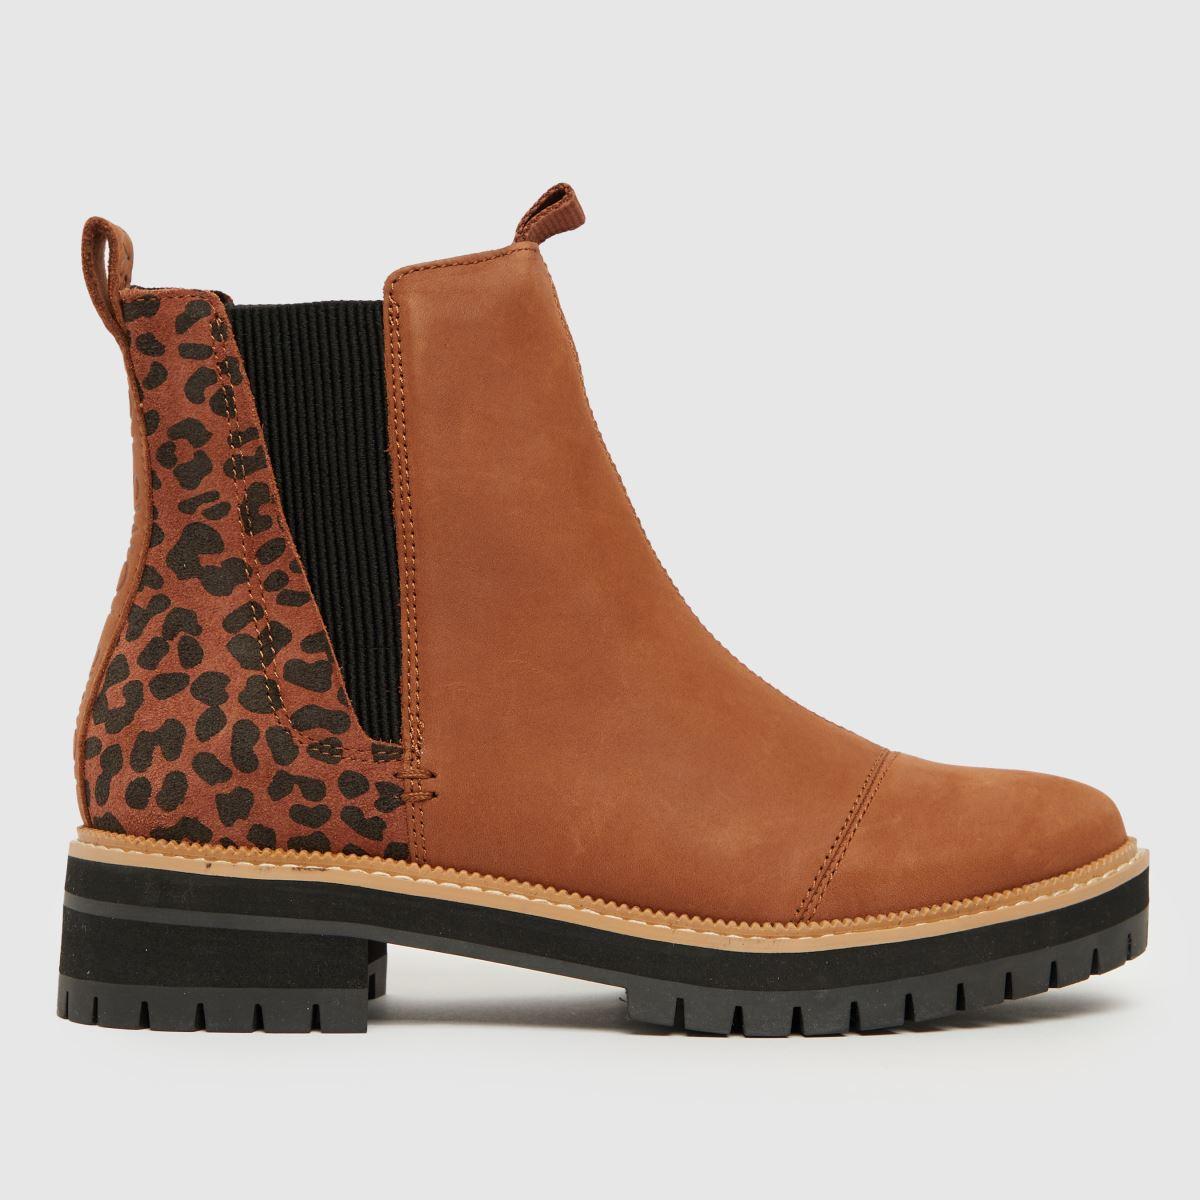 TOMS Brown Dakota Boots